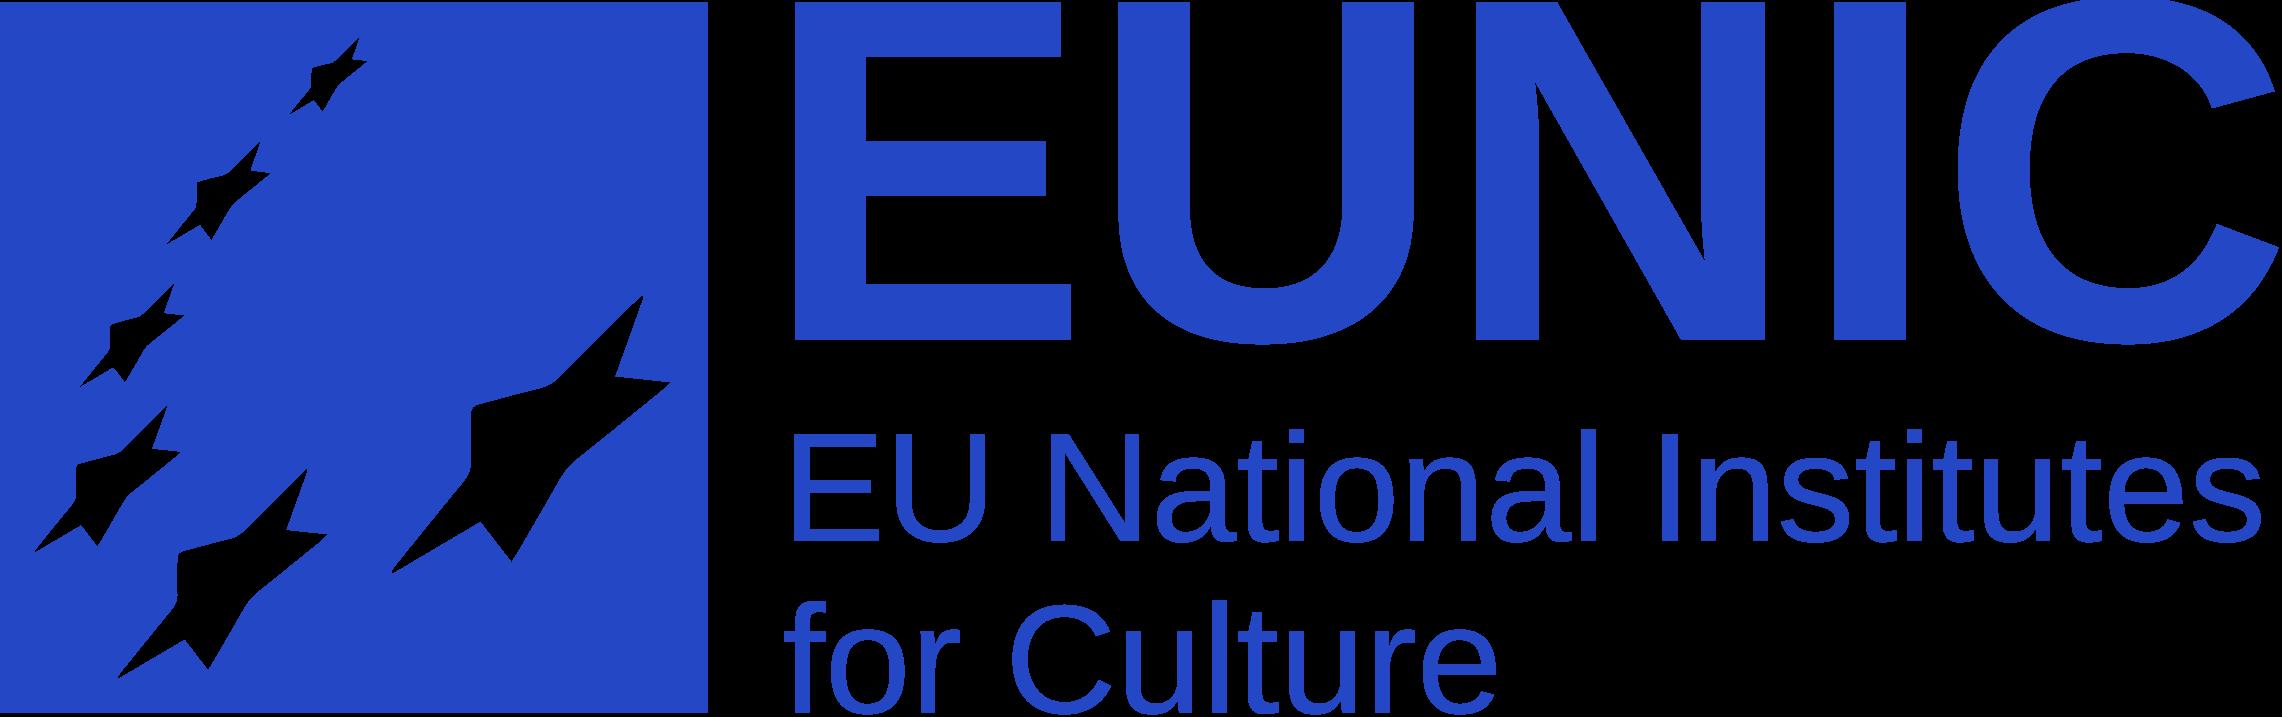 Logo EUNIC-RGB-blue1